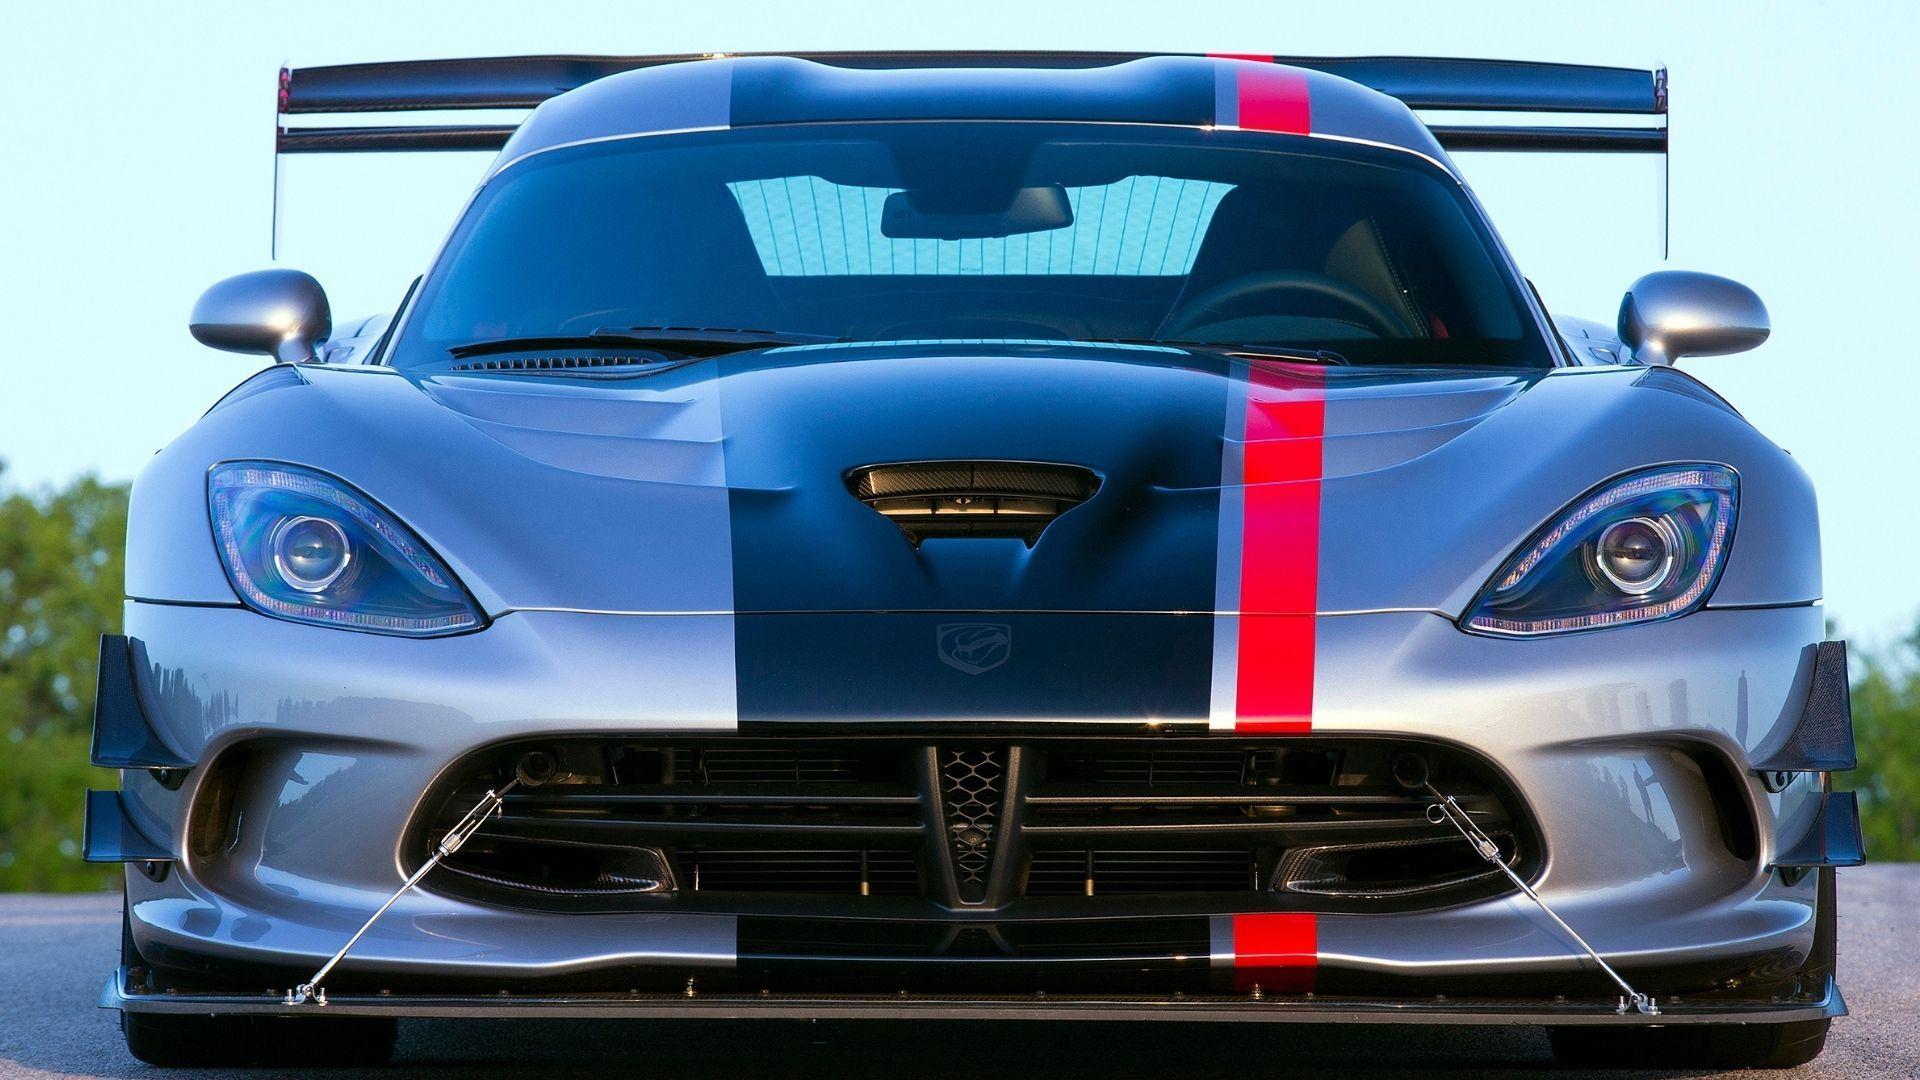 Dodge Viper Sales Log 4 In 2020 In 2021 Dodge Viper Viper Acr 2016 Dodge Viper